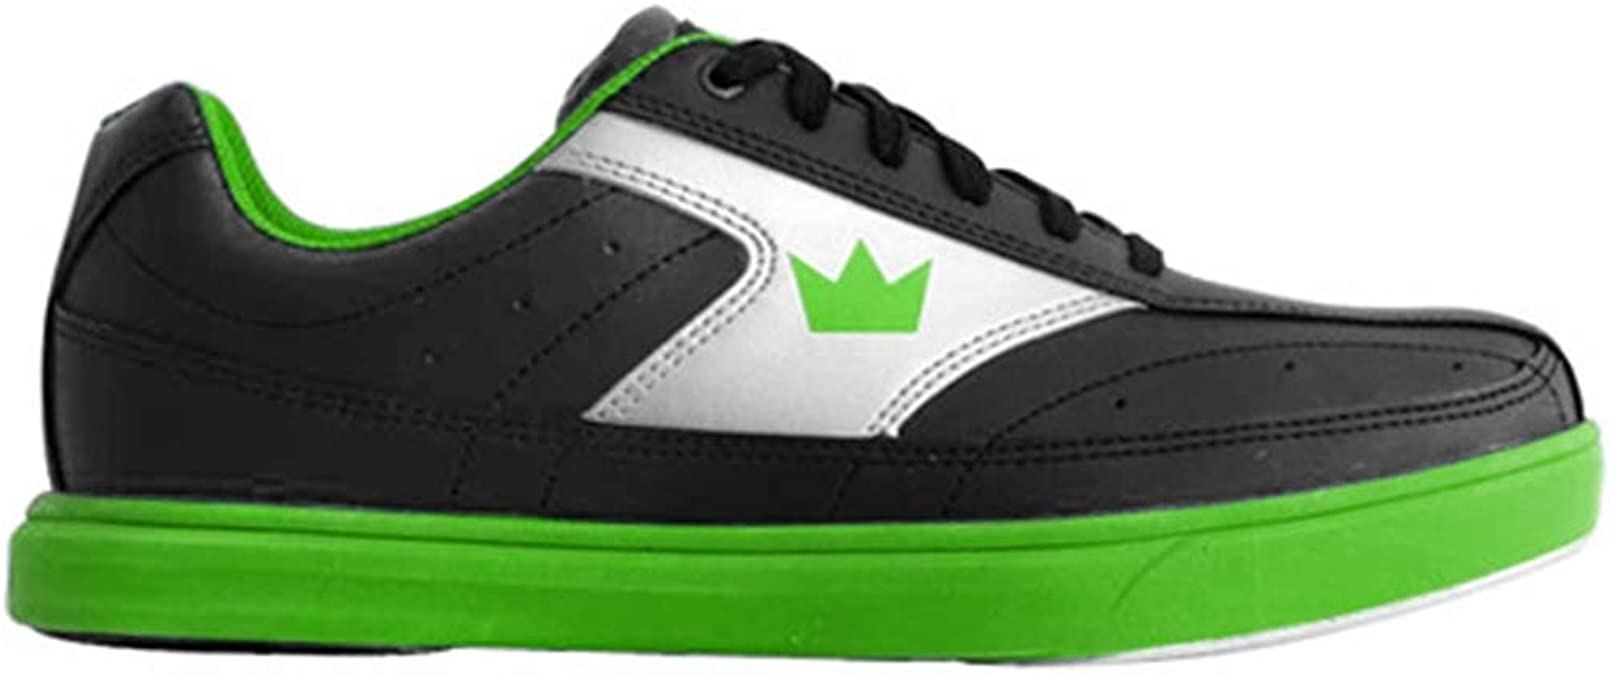 Brunswick Frenzy Mens Bowling Shoe Navy//Green 13.0